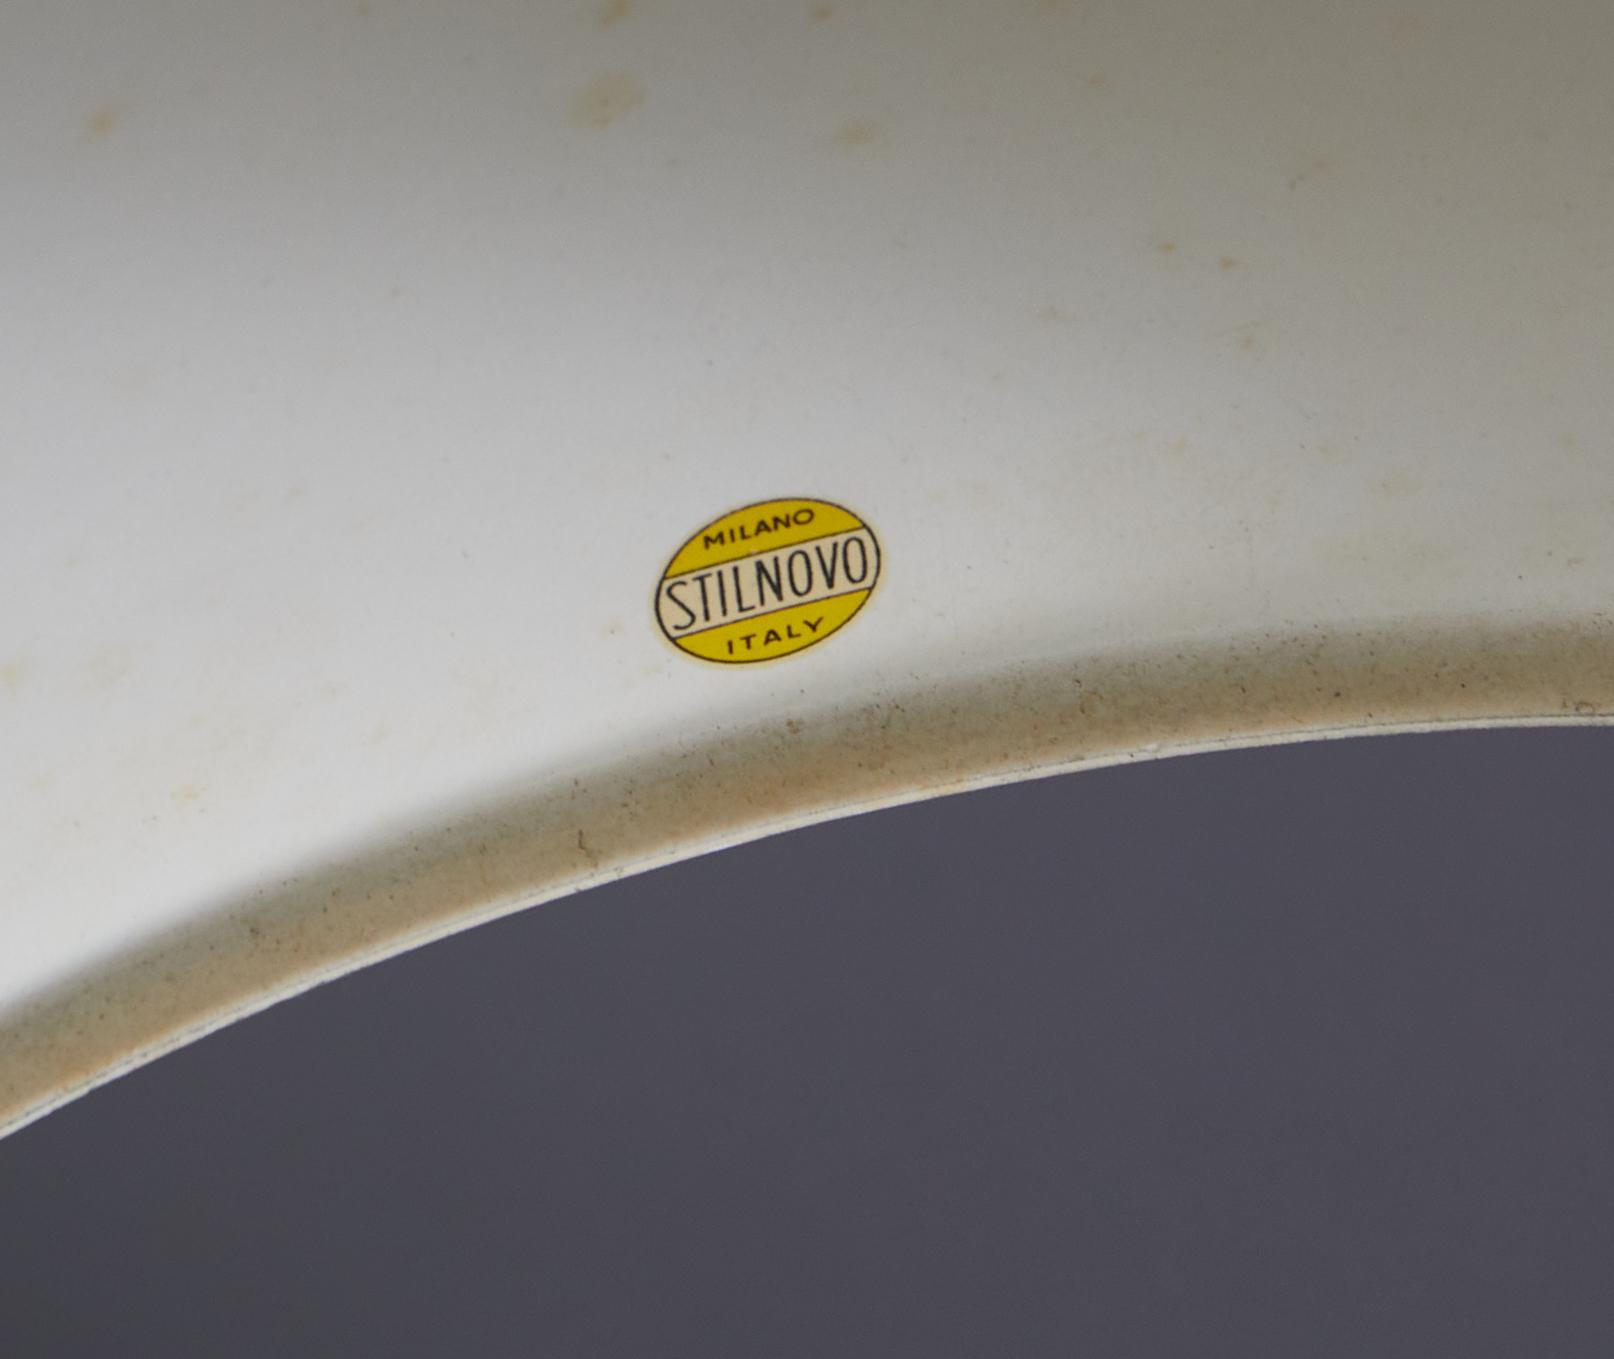 brass-wall-lamp-model-2061-by-gaetano-scolari-for-stilnovo-1954-image-16